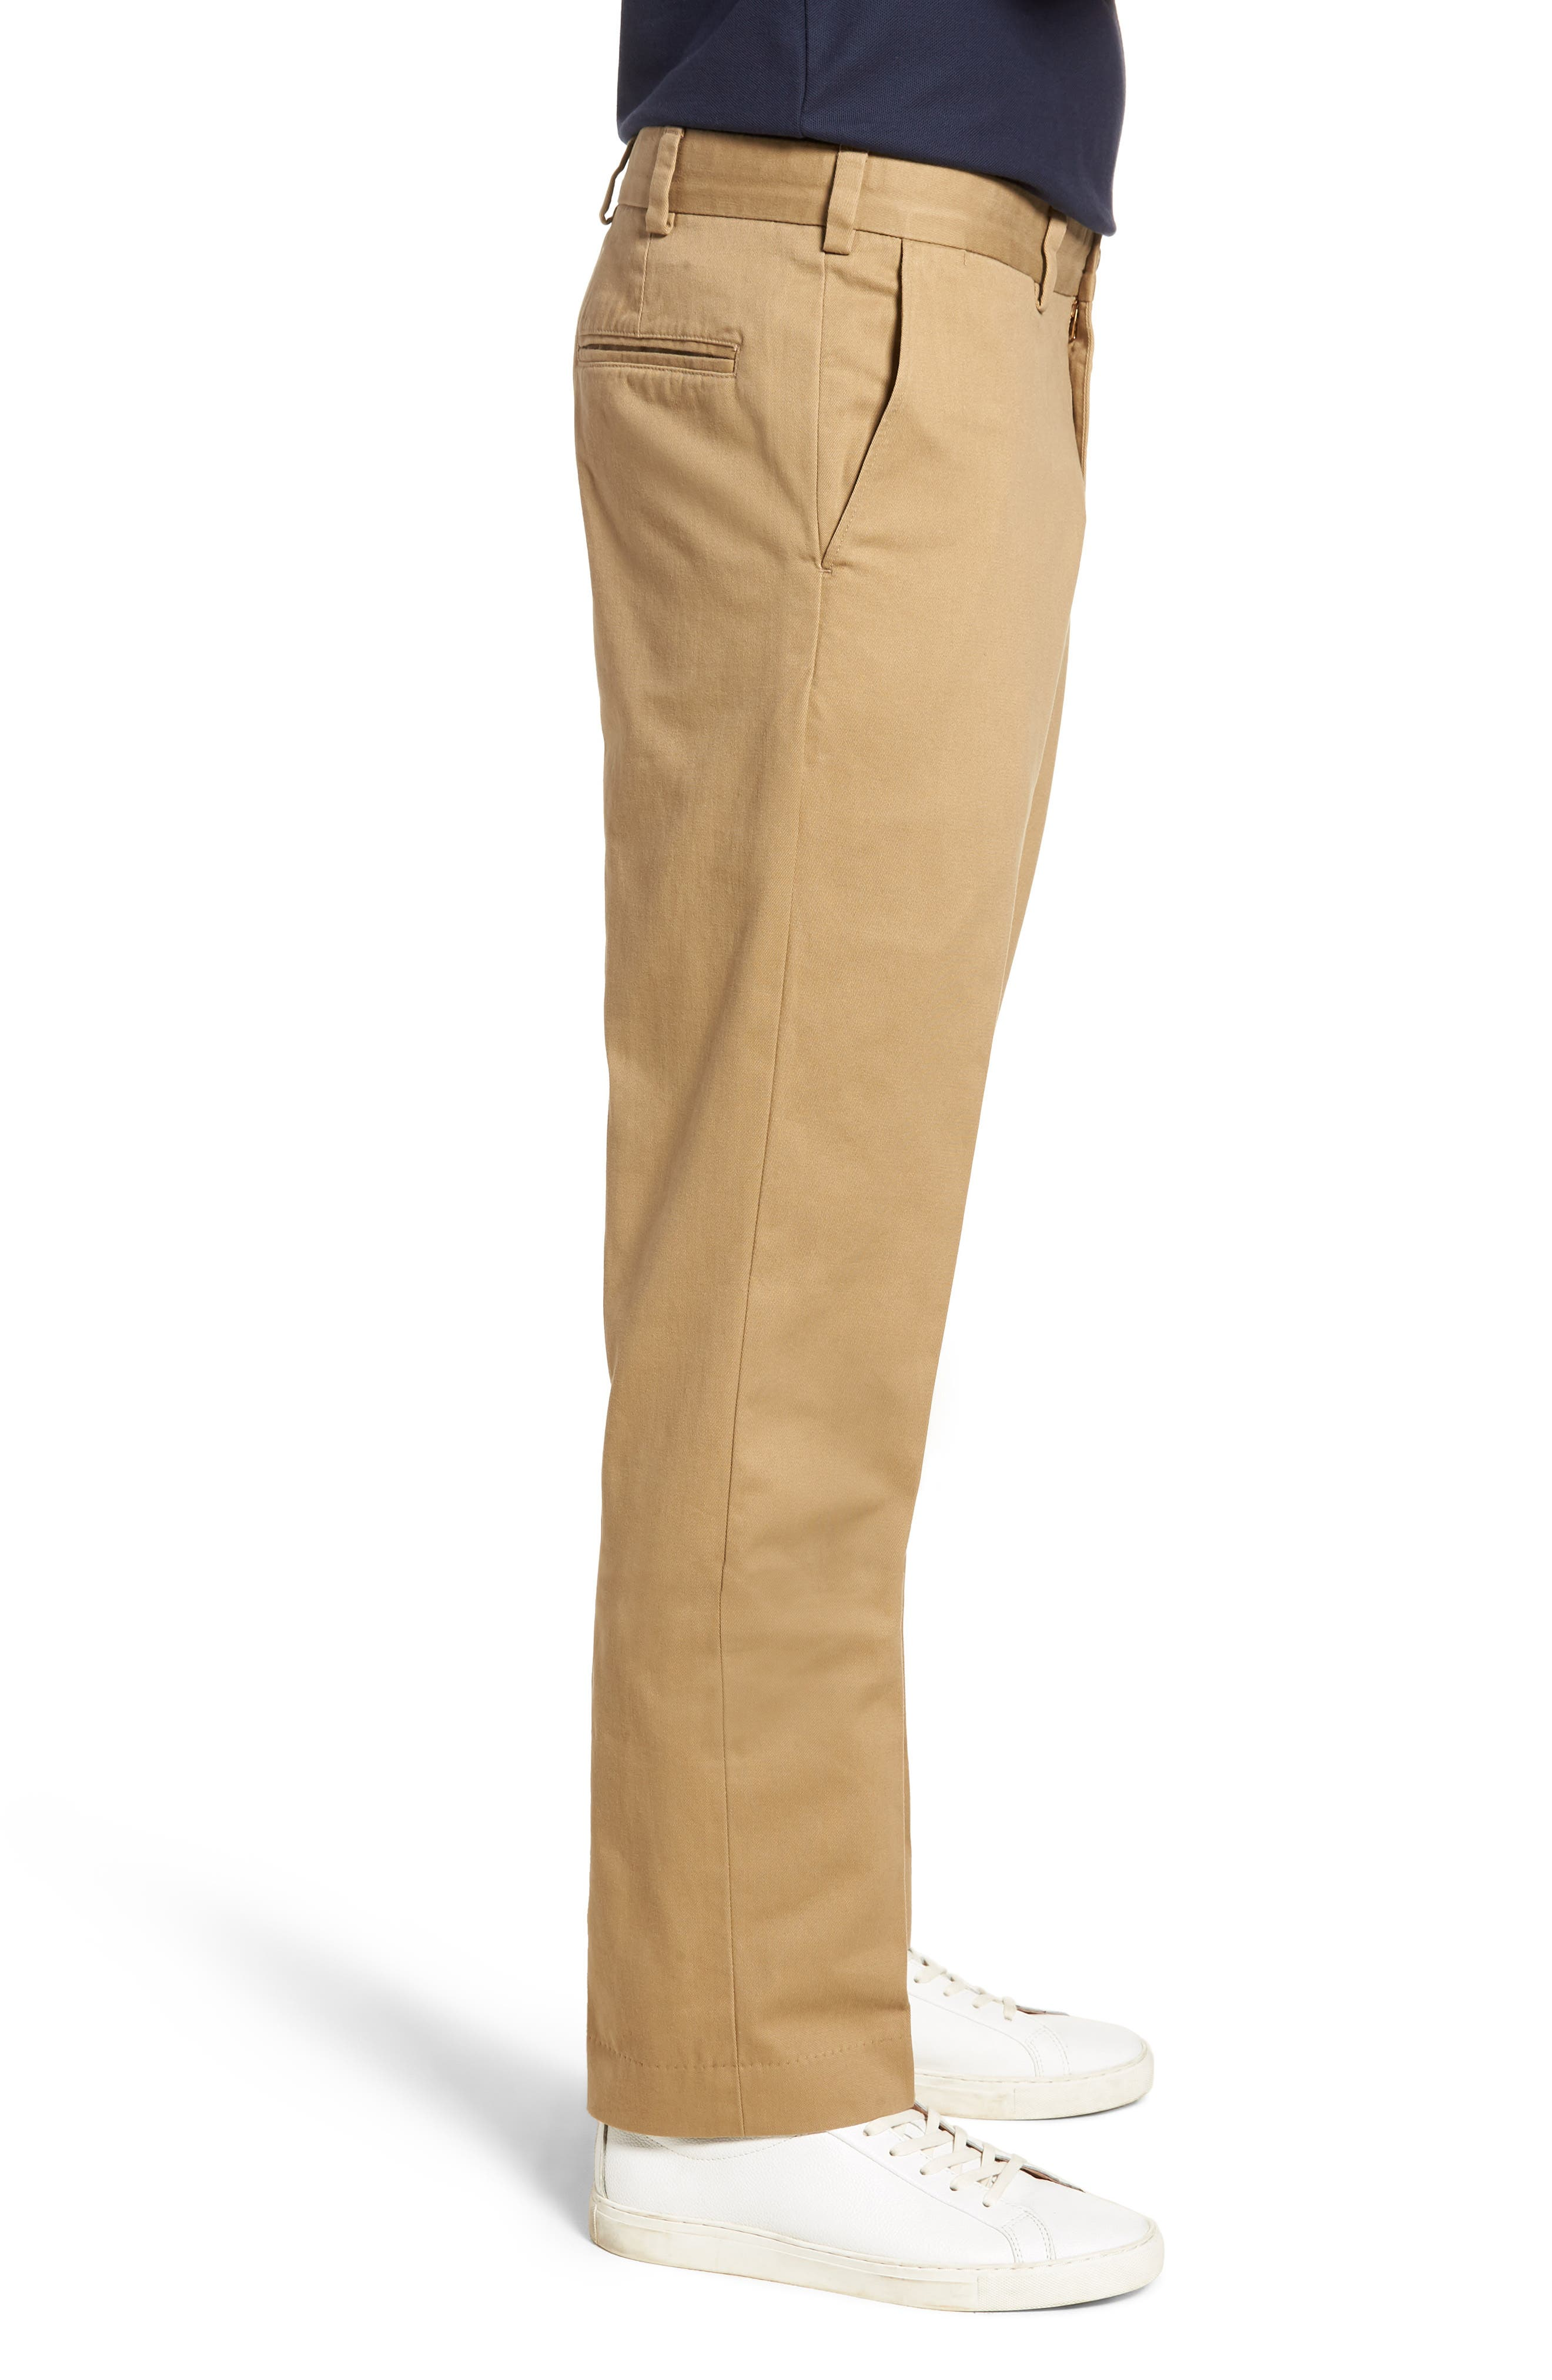 M3 Straight Fit Vintage Twill Flat Front Pants,                             Alternate thumbnail 3, color,                             British Khaki